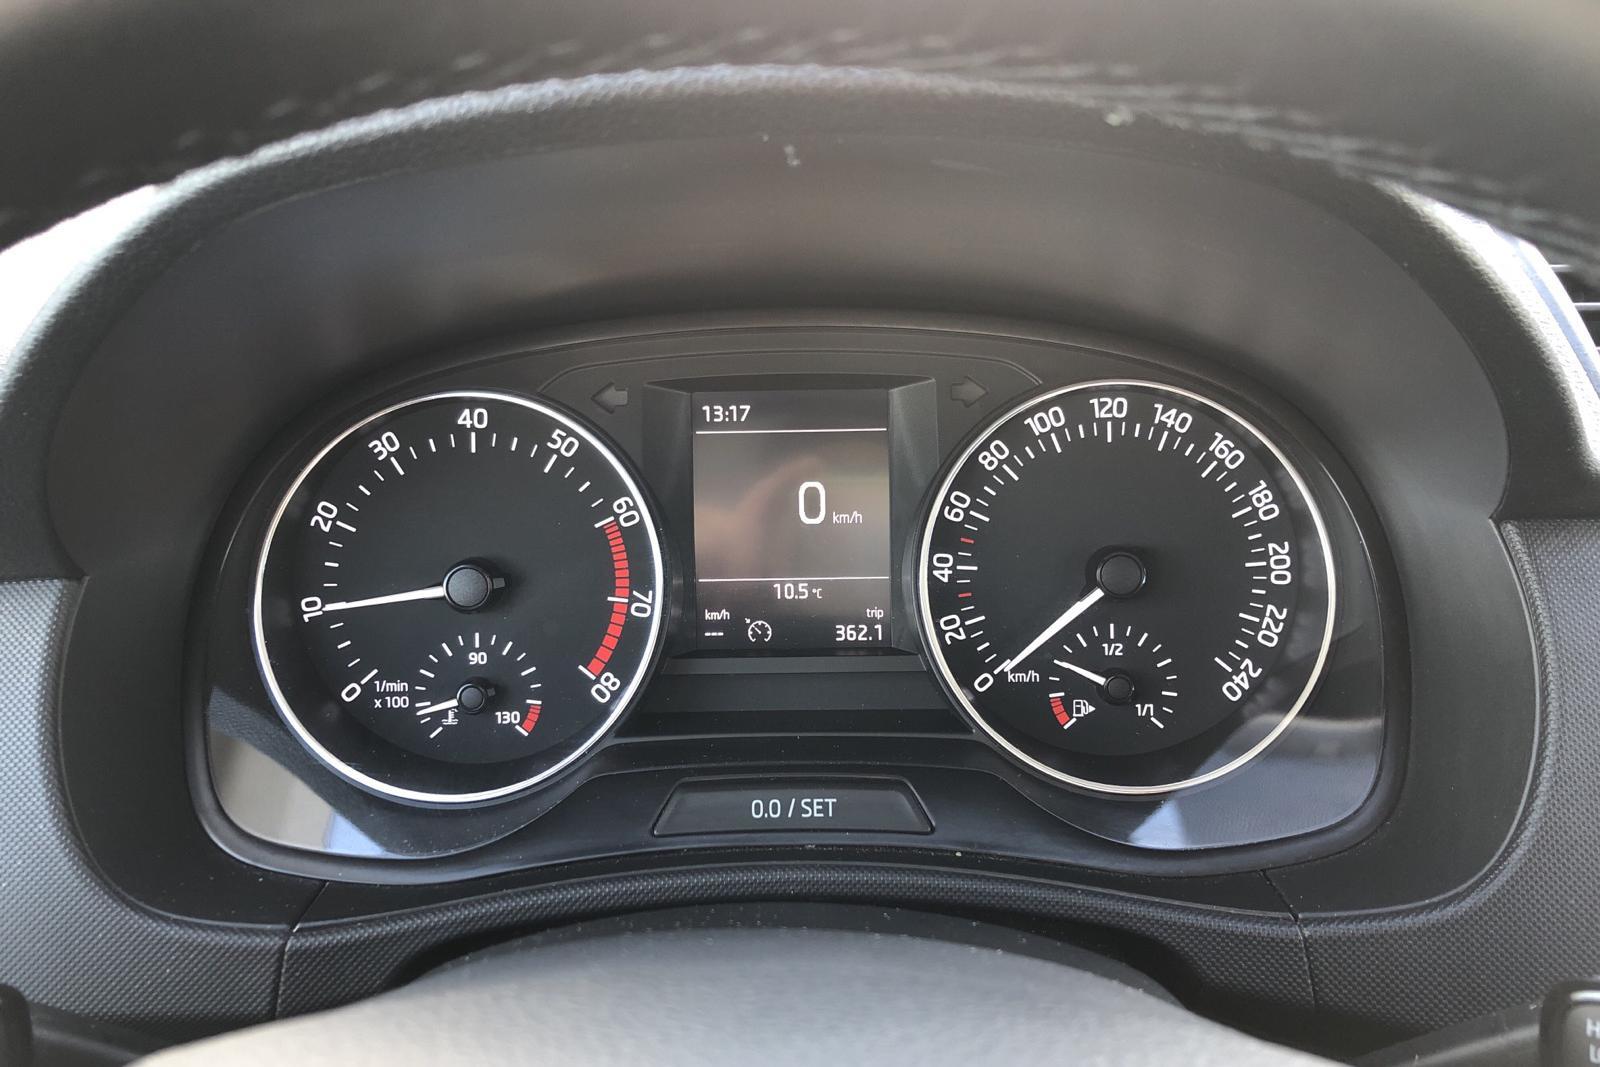 Skoda Fabia 1.0 TSI Kombi (95hk) - 30 810 km - Manual - red - 2018